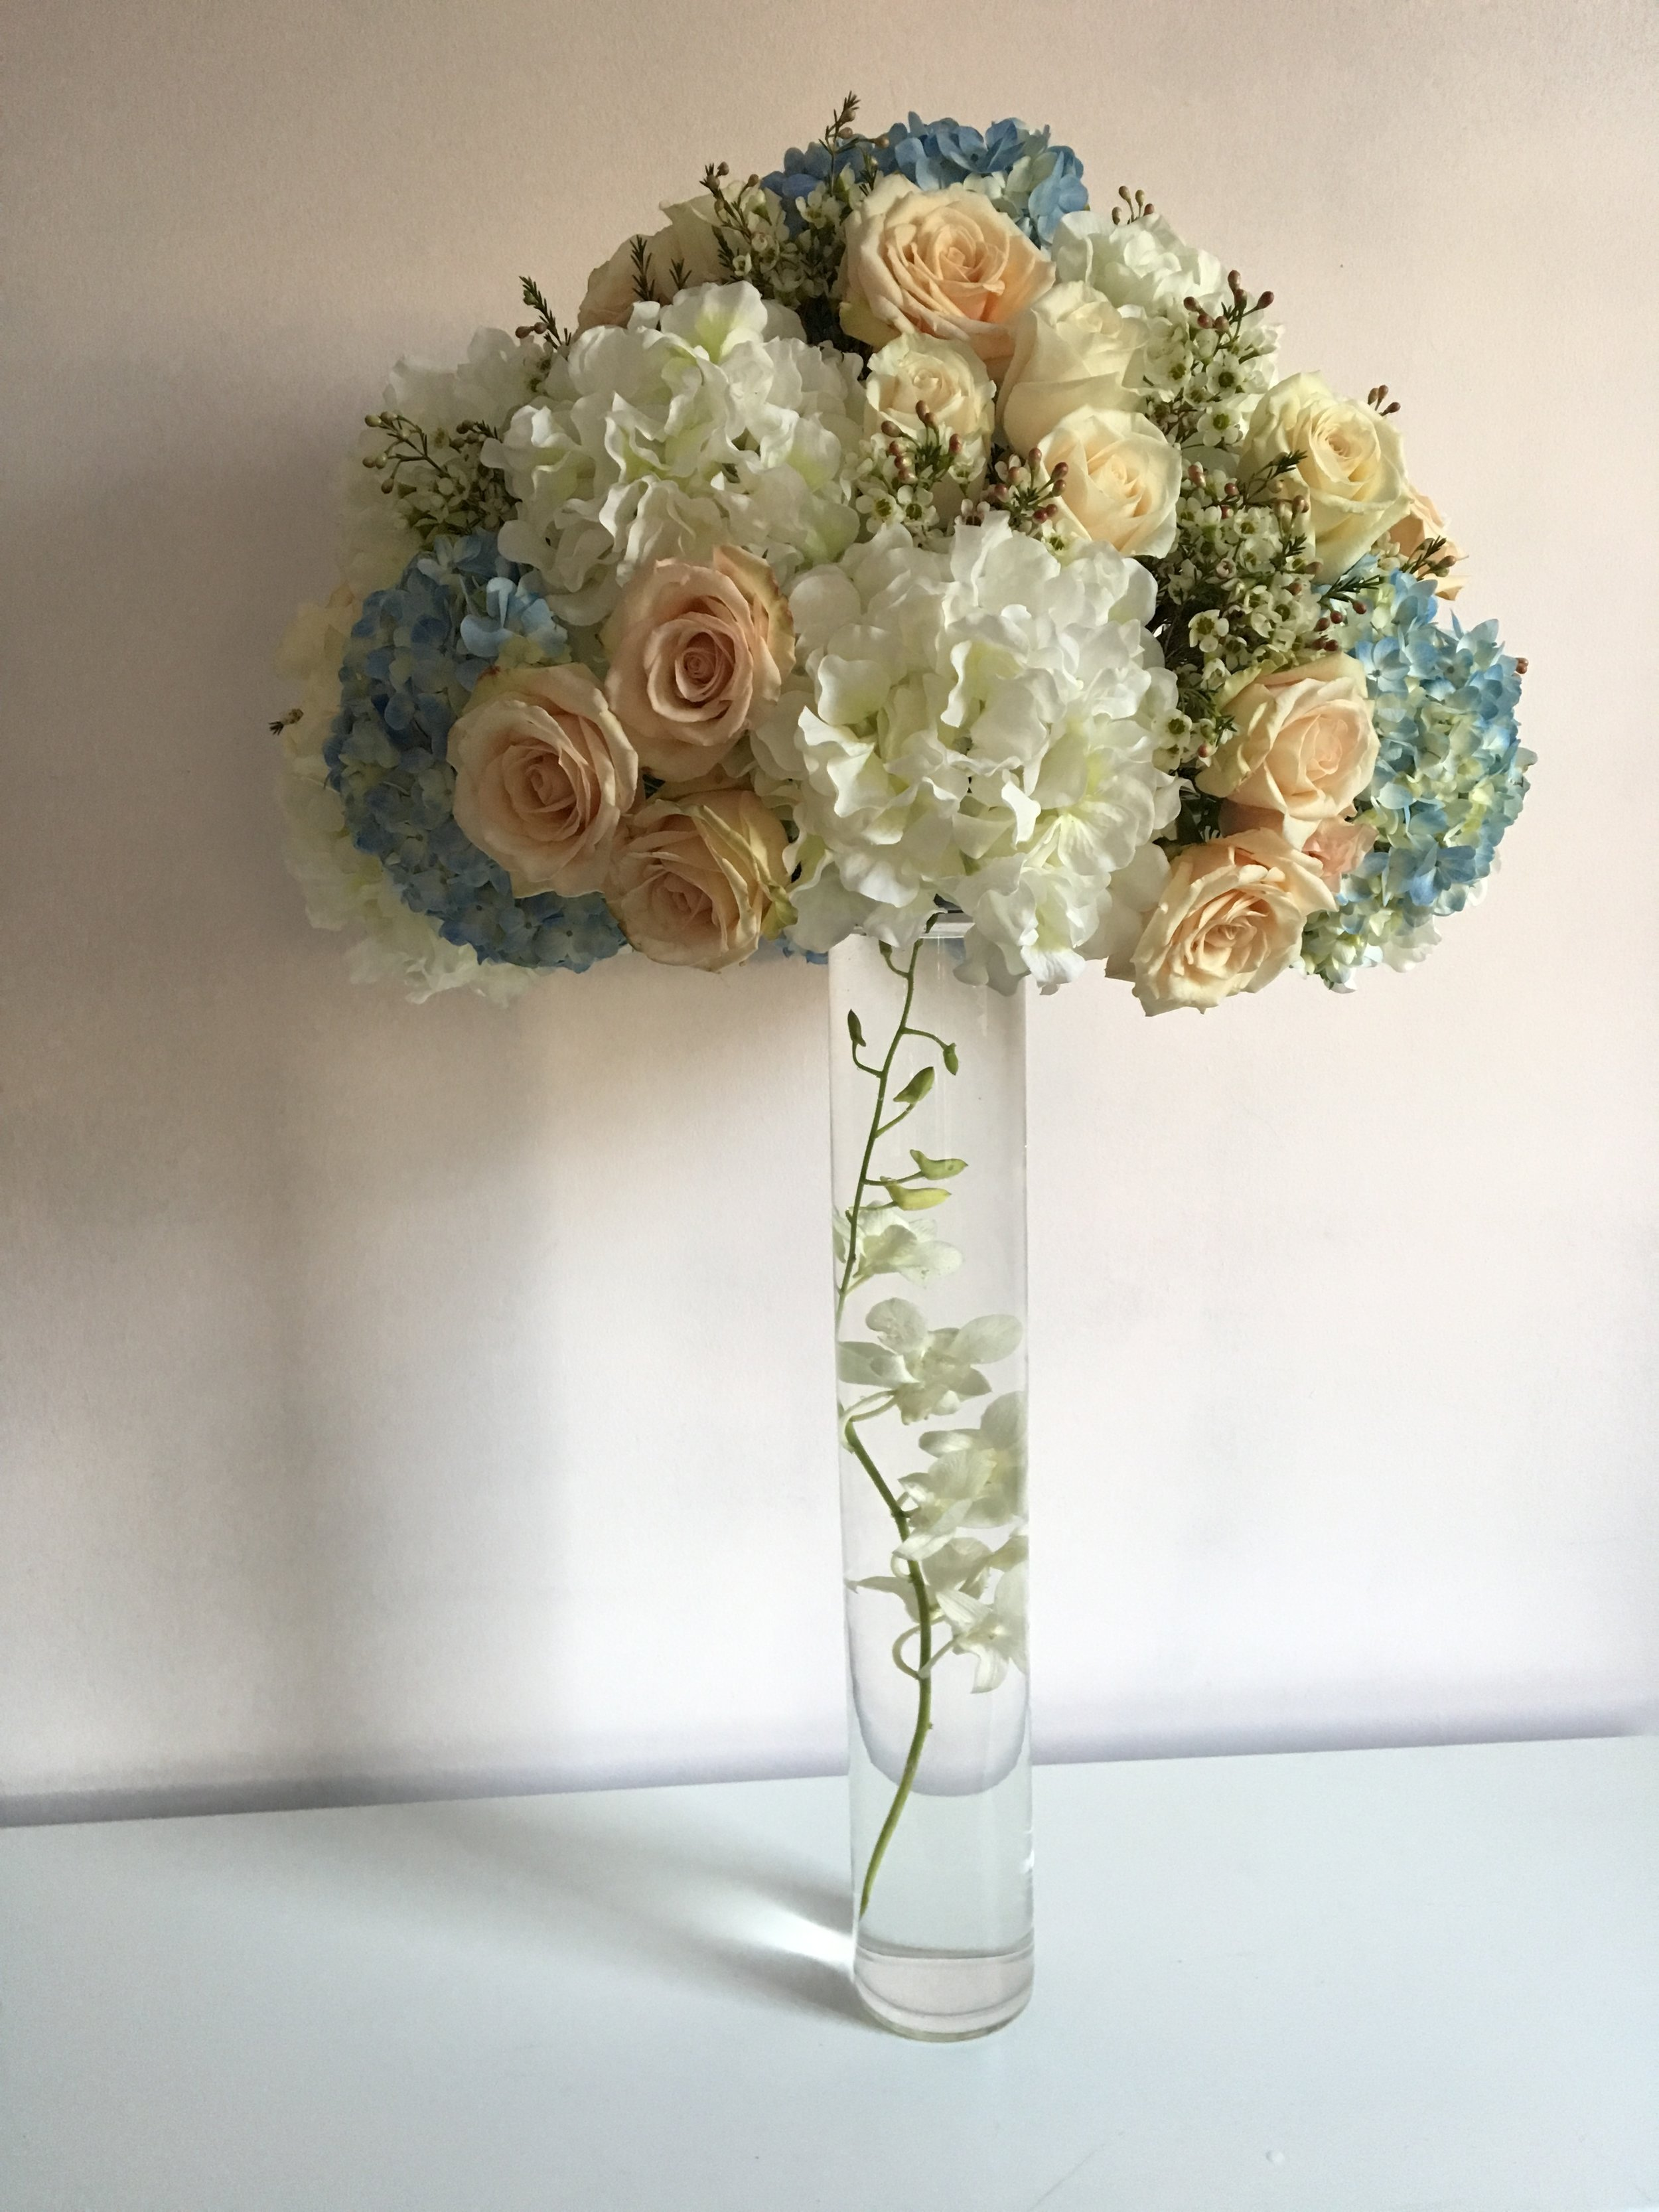 Evelisa Floral & Design: blue, blush & white